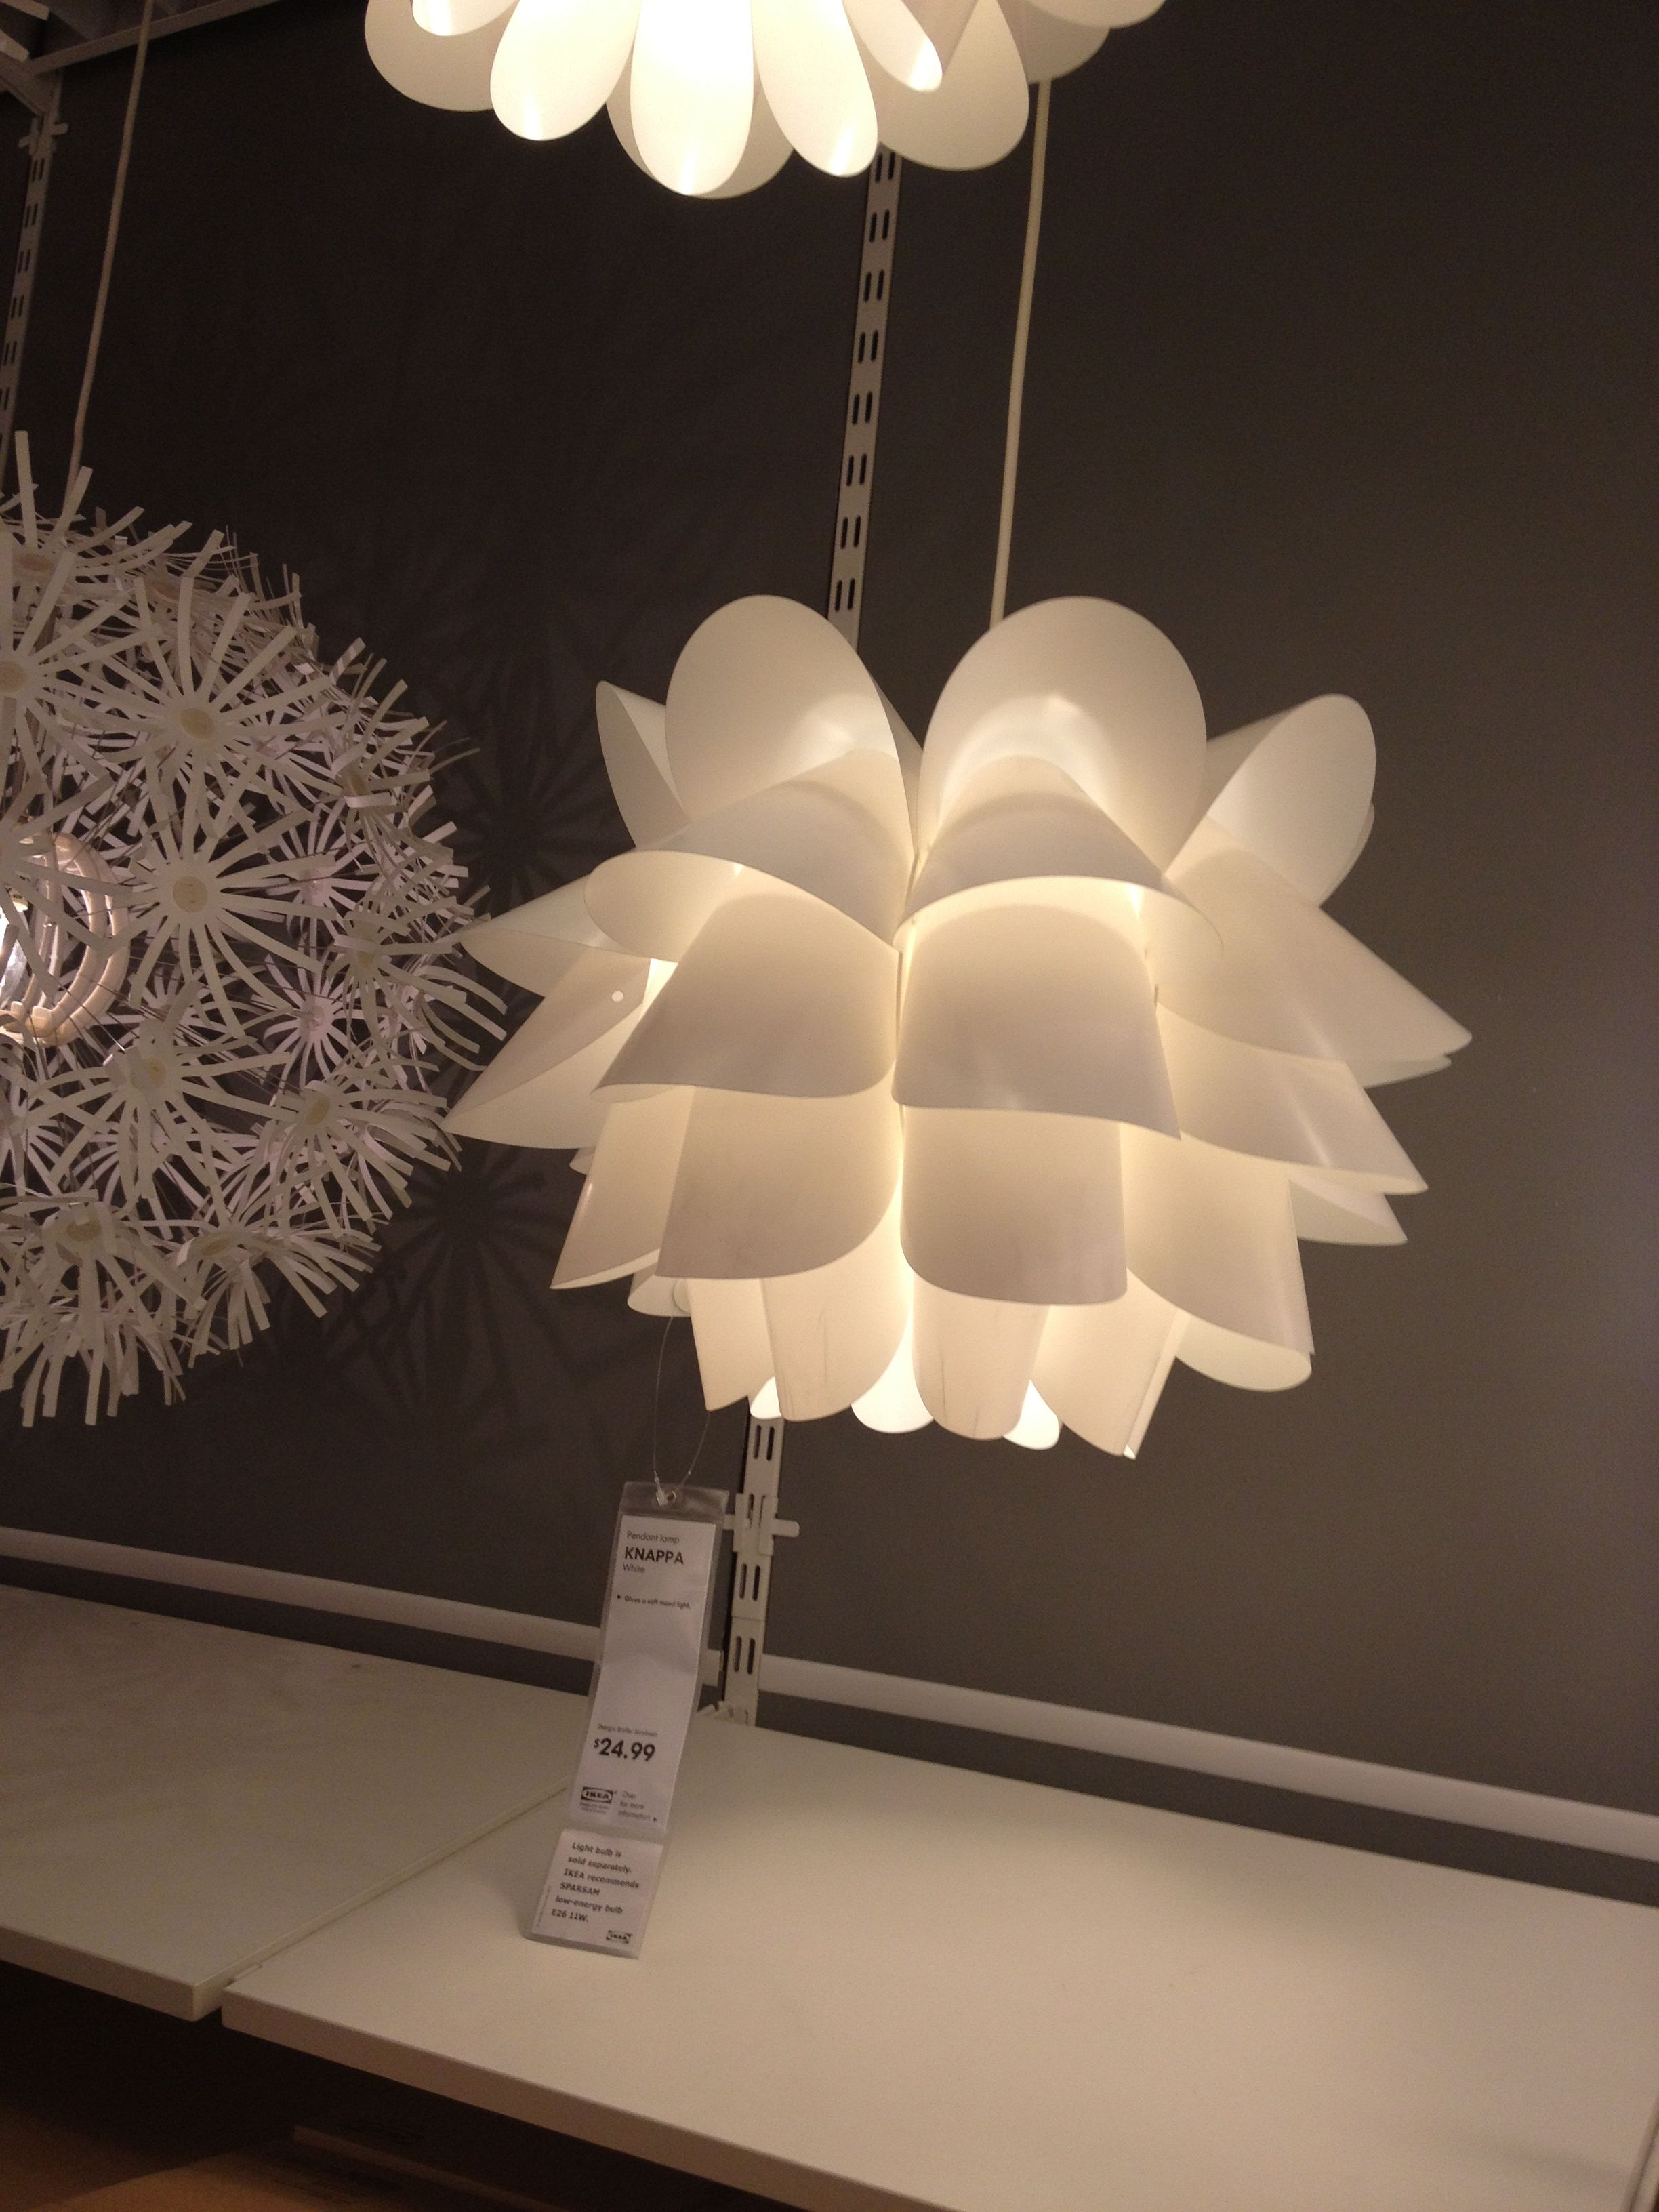 Ikea light addison house lighting ceiling lights addison house